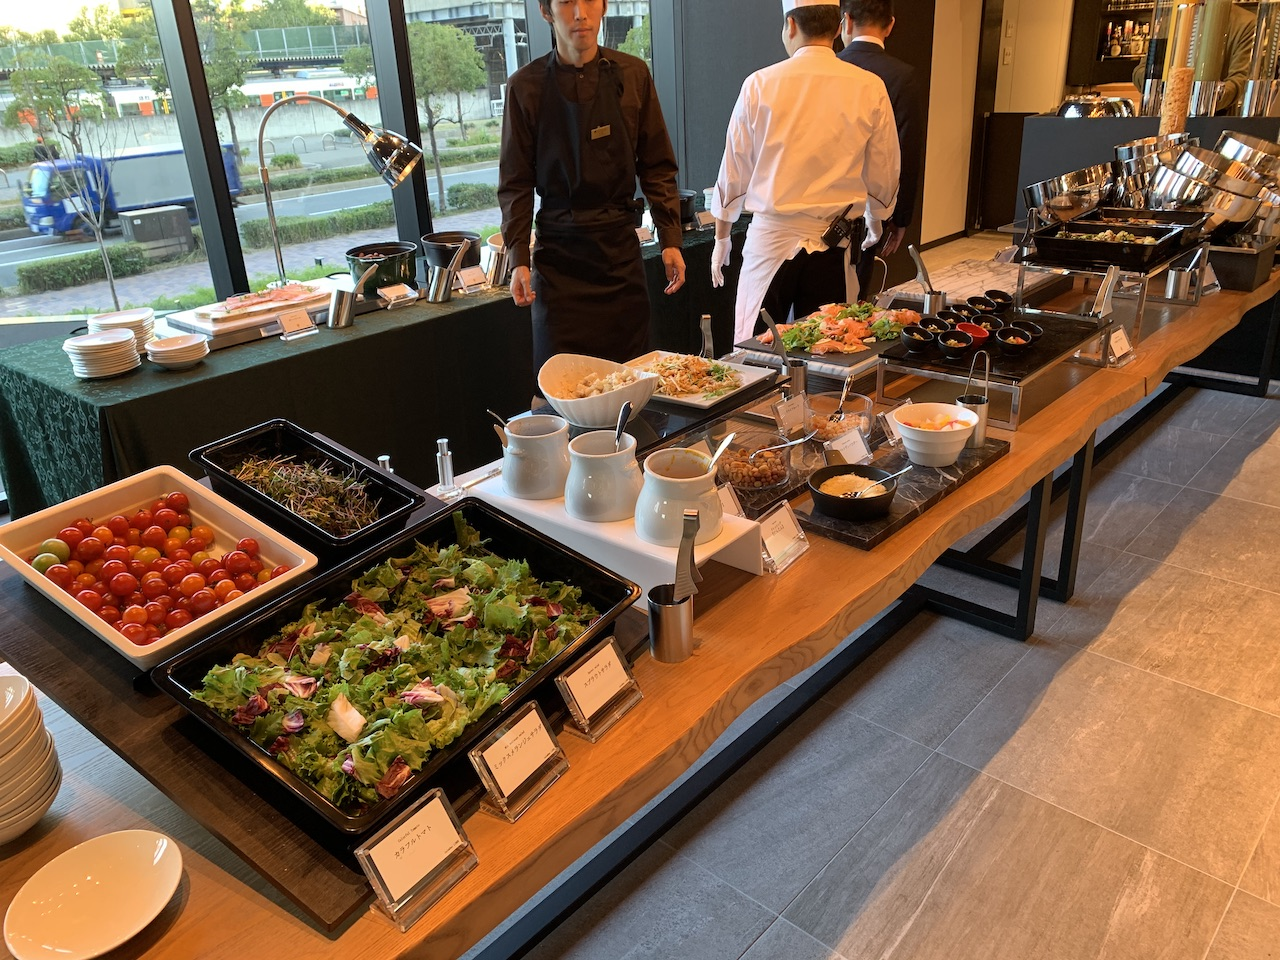 liber-hotel-usj-restaurant-cafe-3